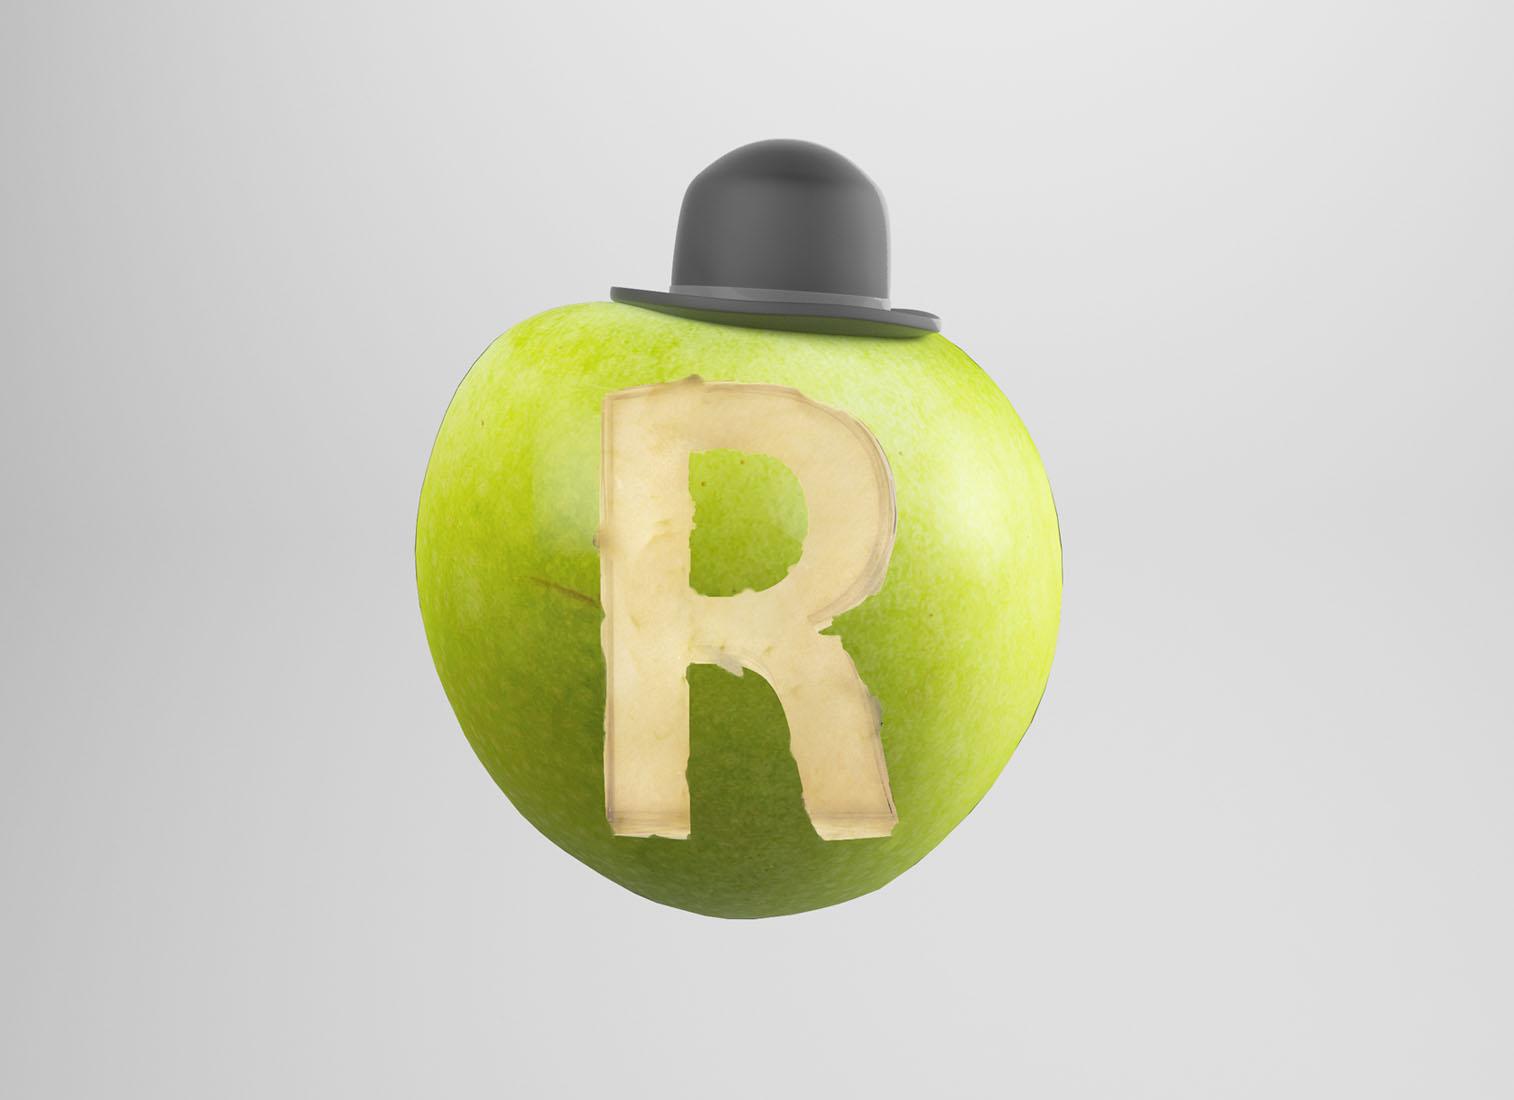 r rené magritte